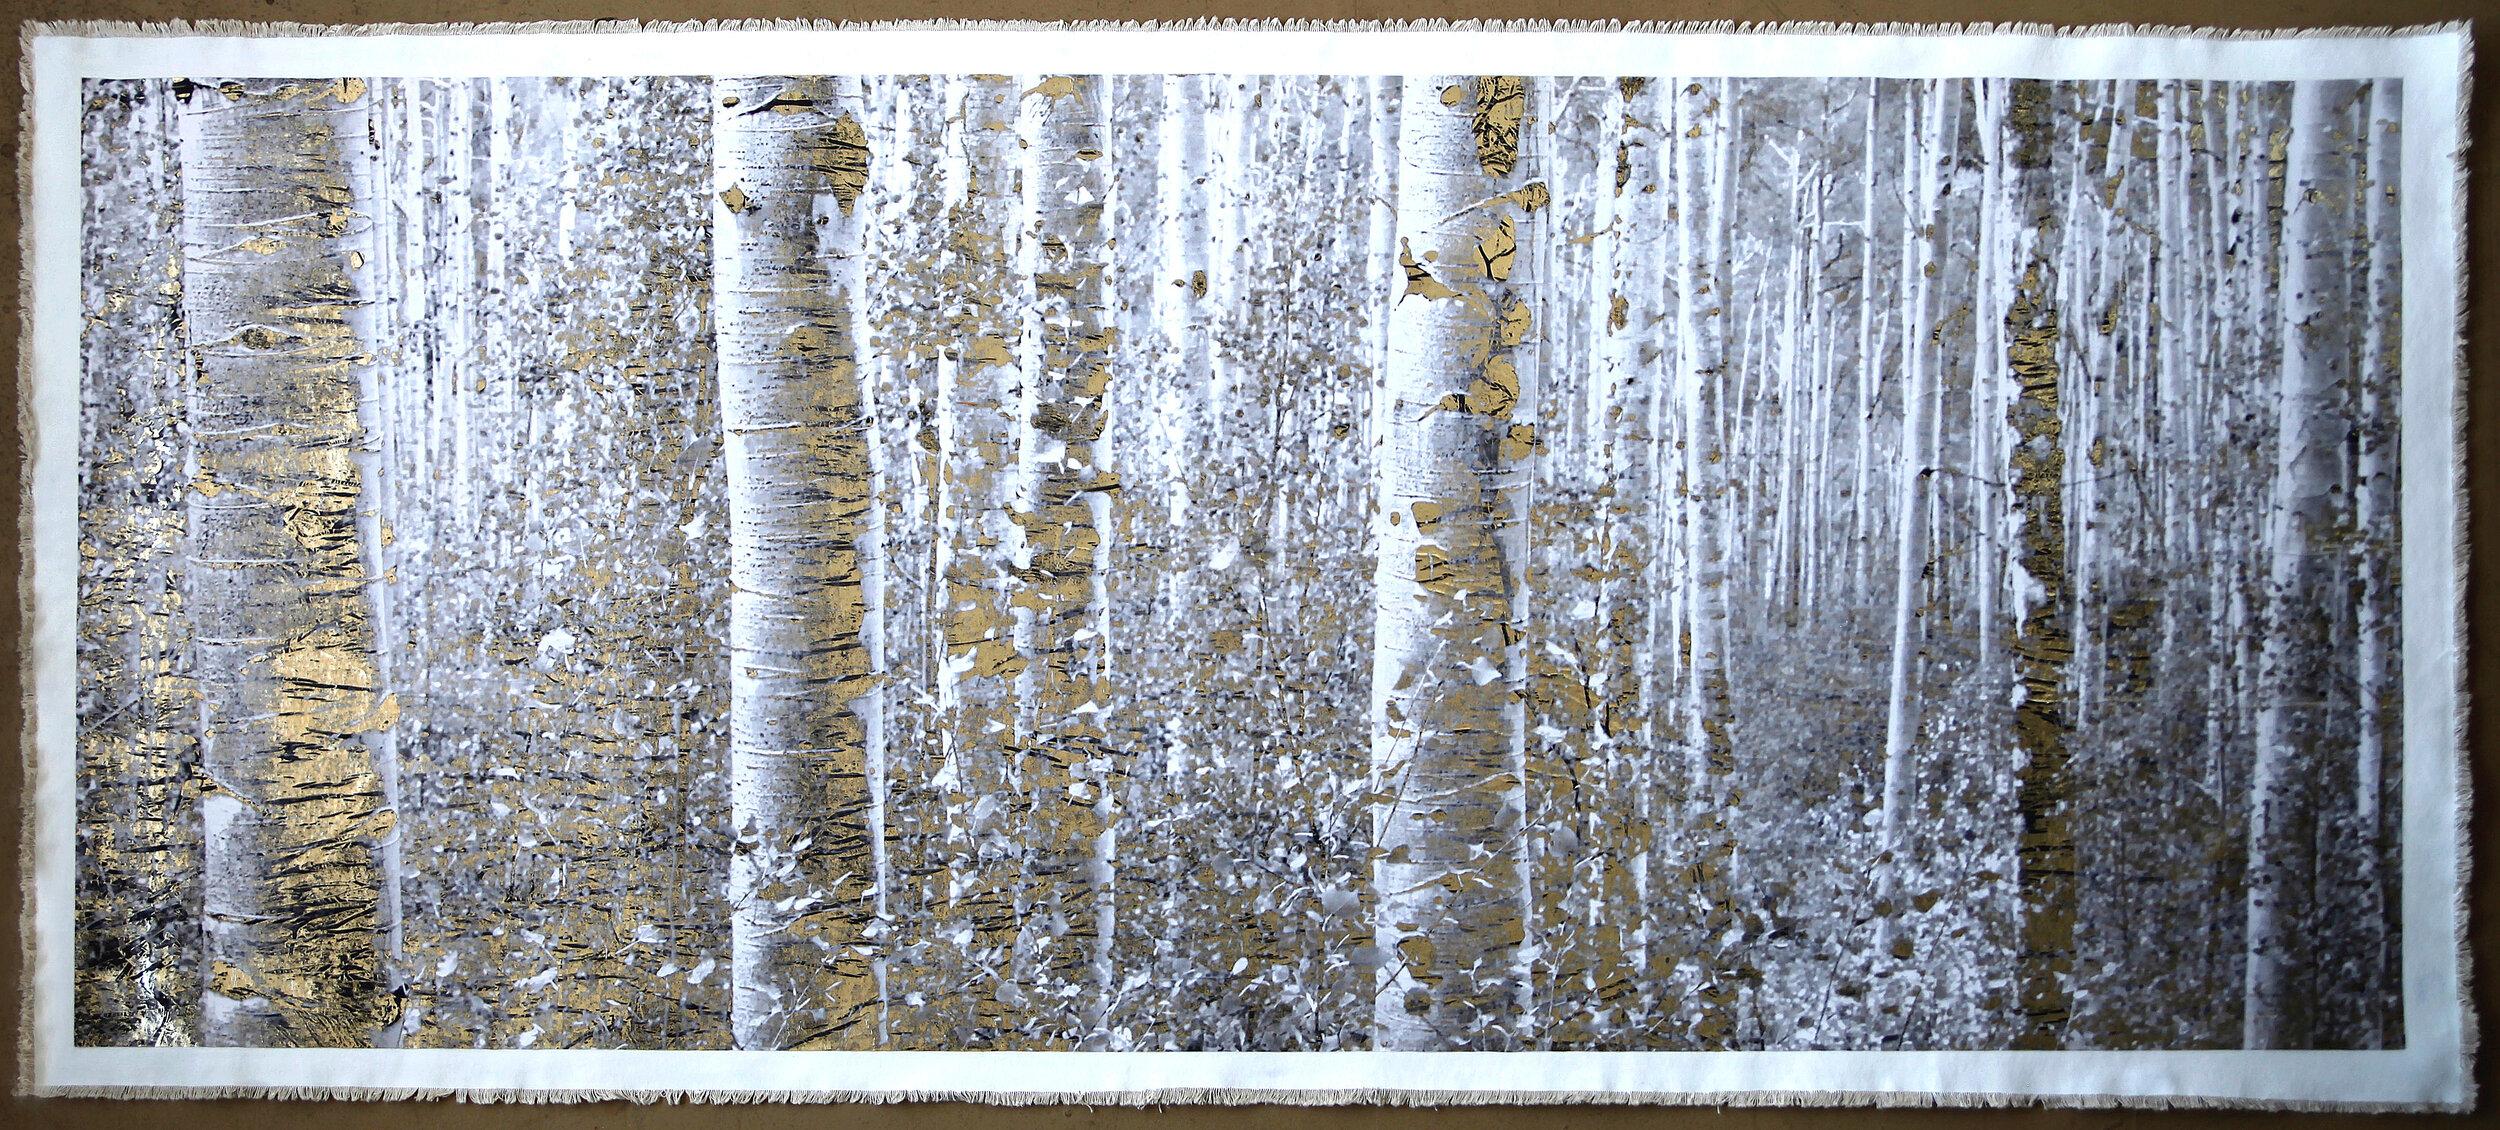 Aspen Forest, Maroon Bells